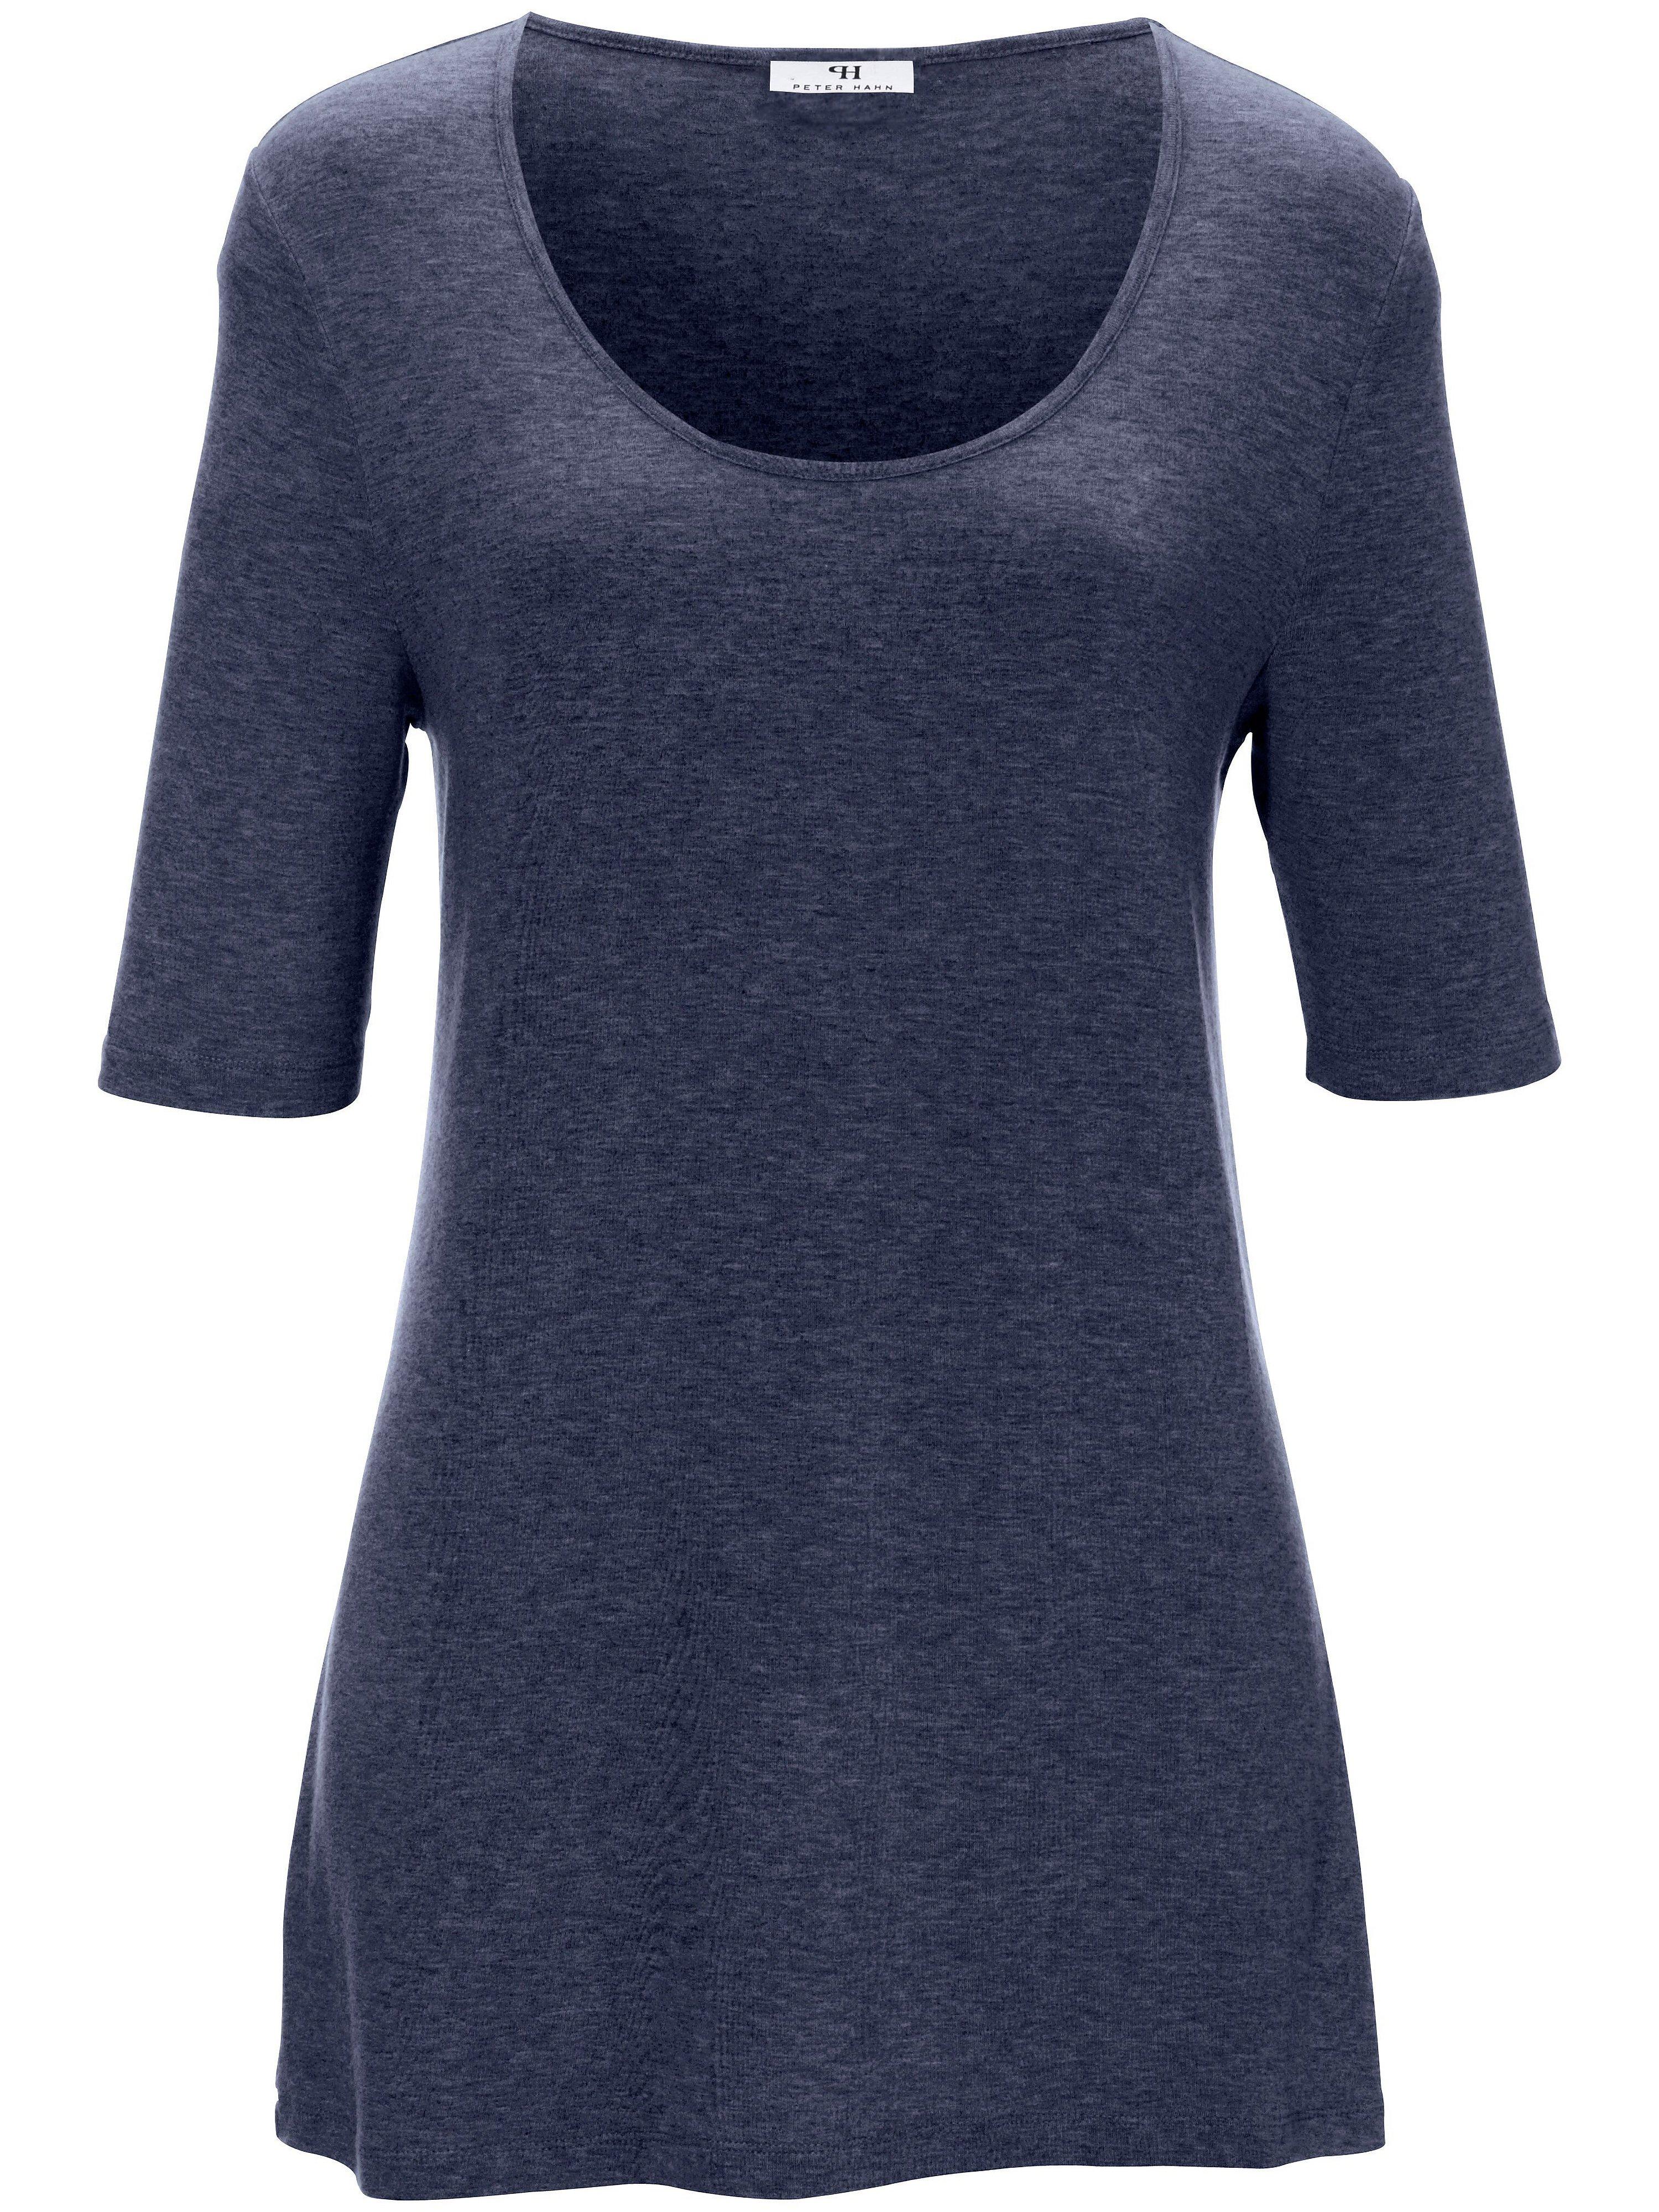 Le T-shirt  Peter Hahn bleu